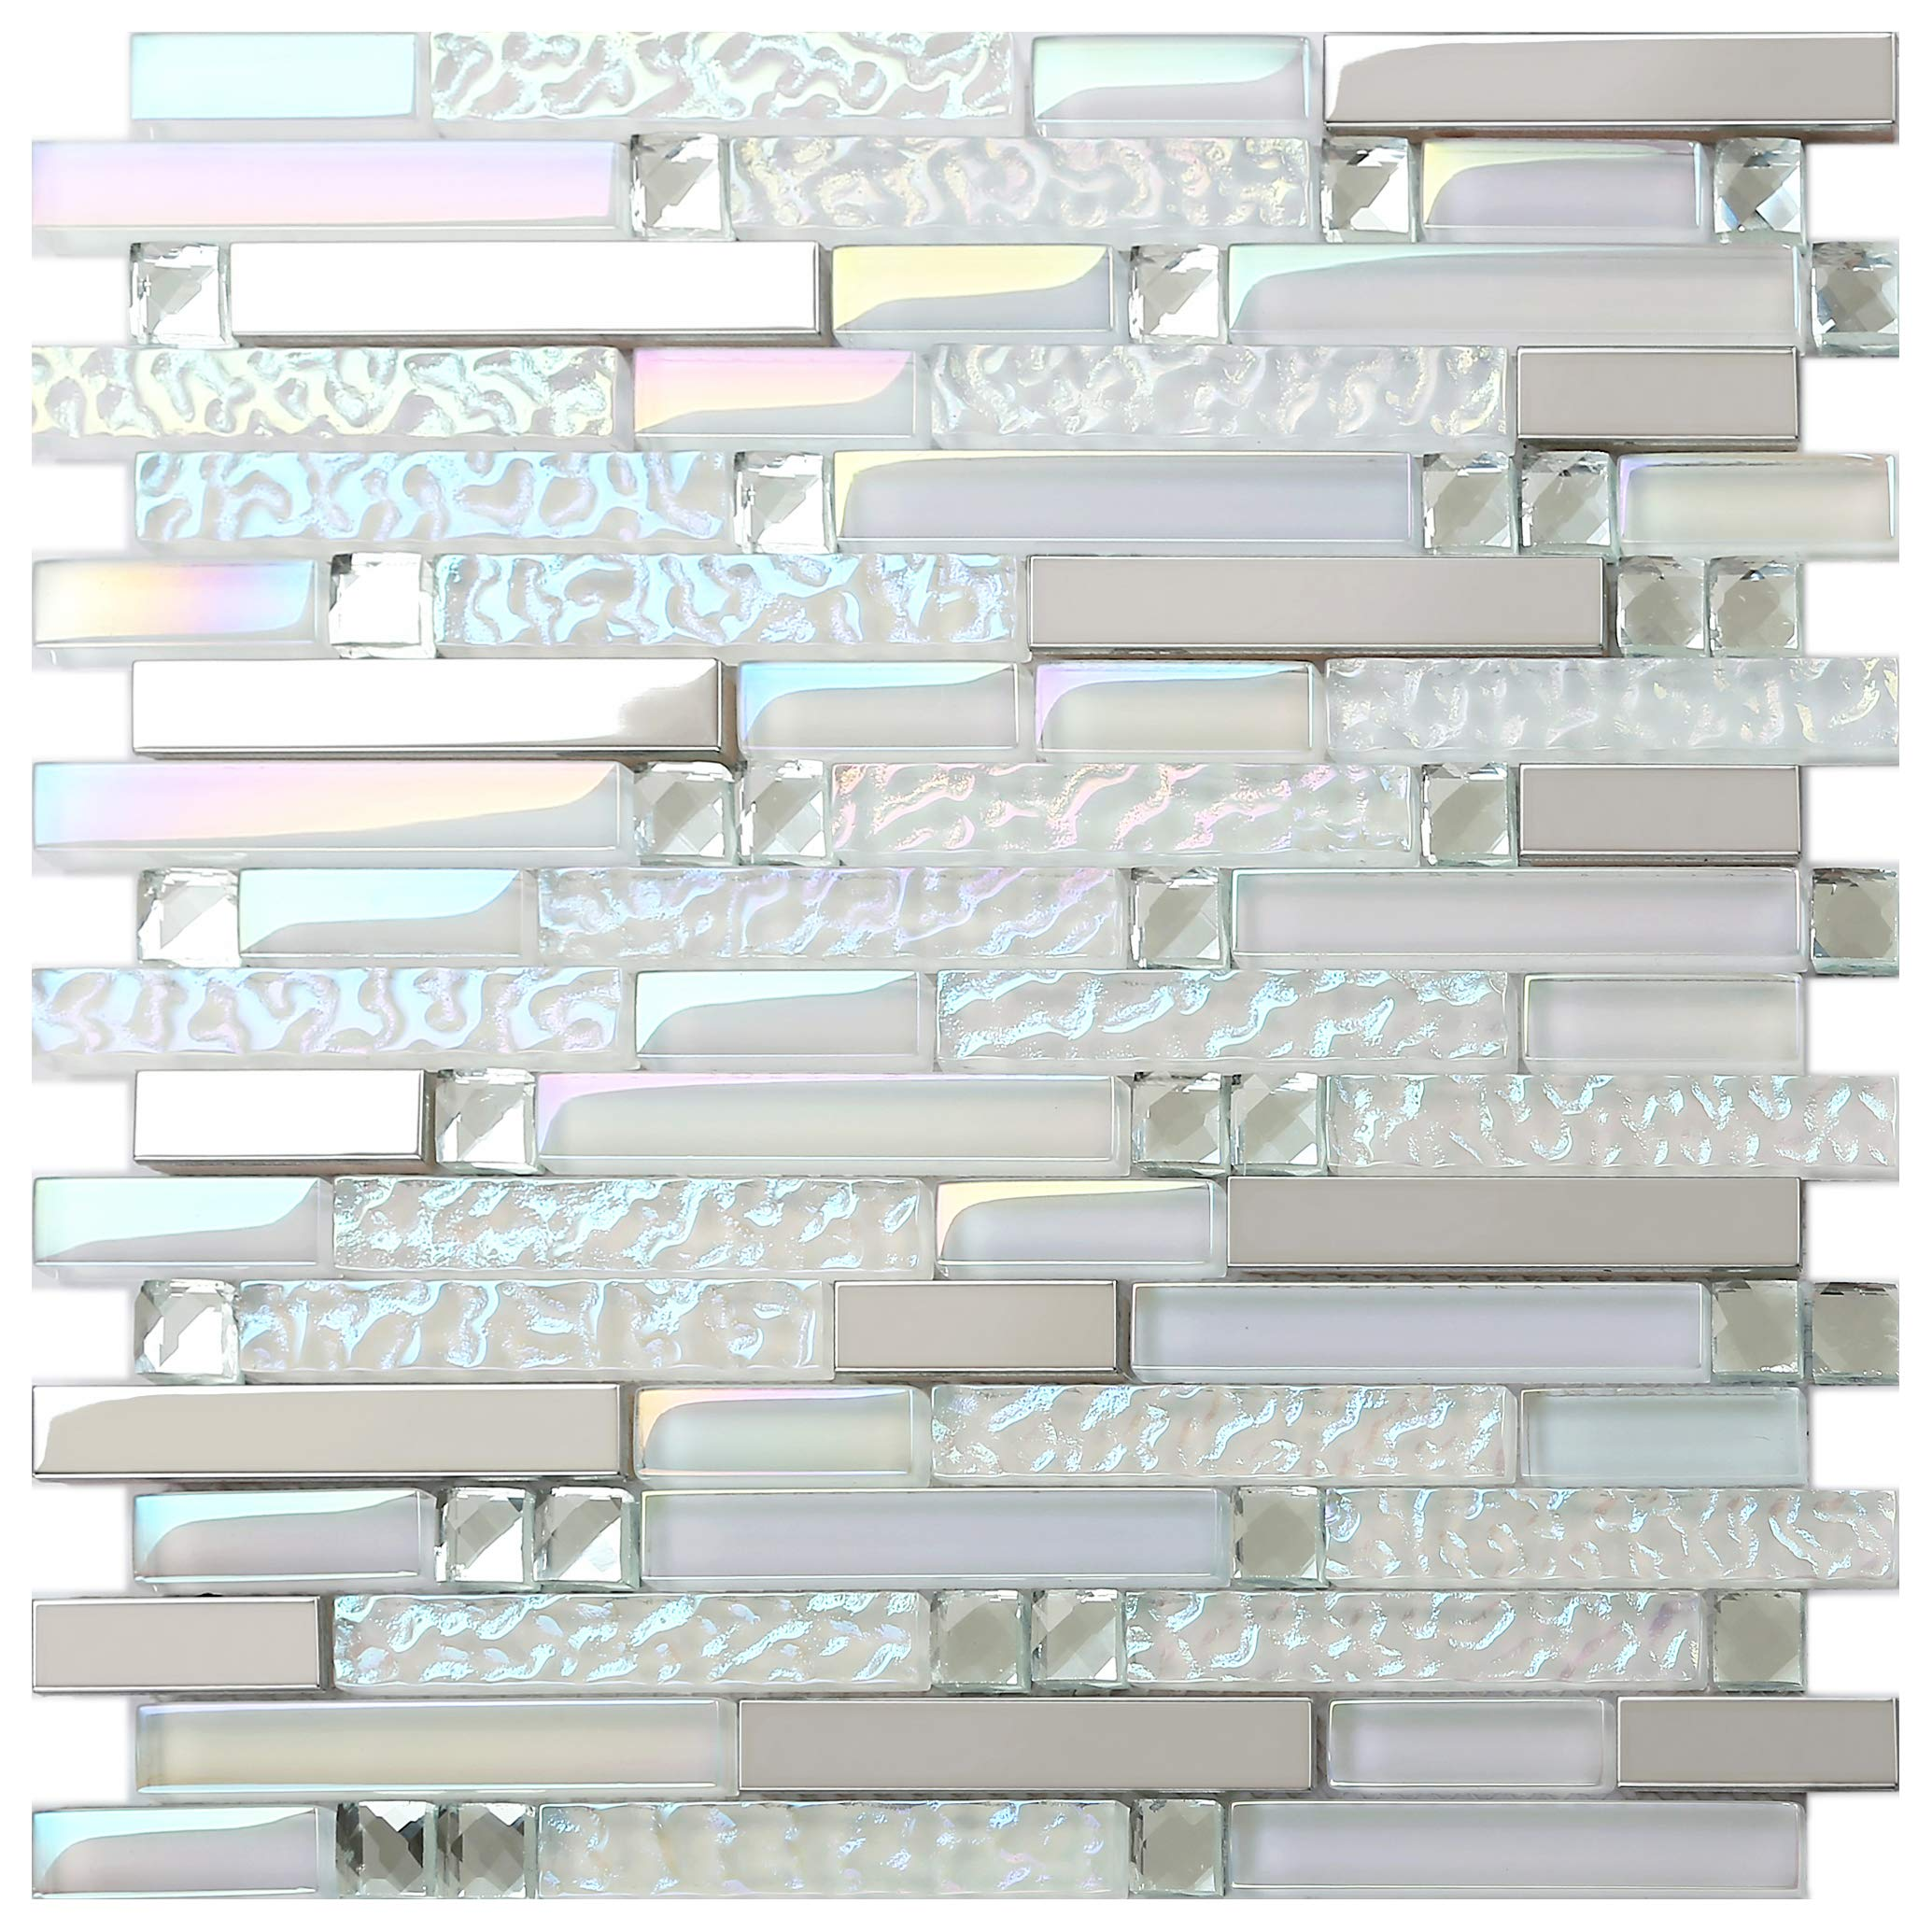 New Design TST Glass Metal Tile Iridescent White Glass Silver Mirror Stainless Steel Blends Interlocking Strip Wall Tiles Big Sale (5 PCS (12'' X 12''/each))